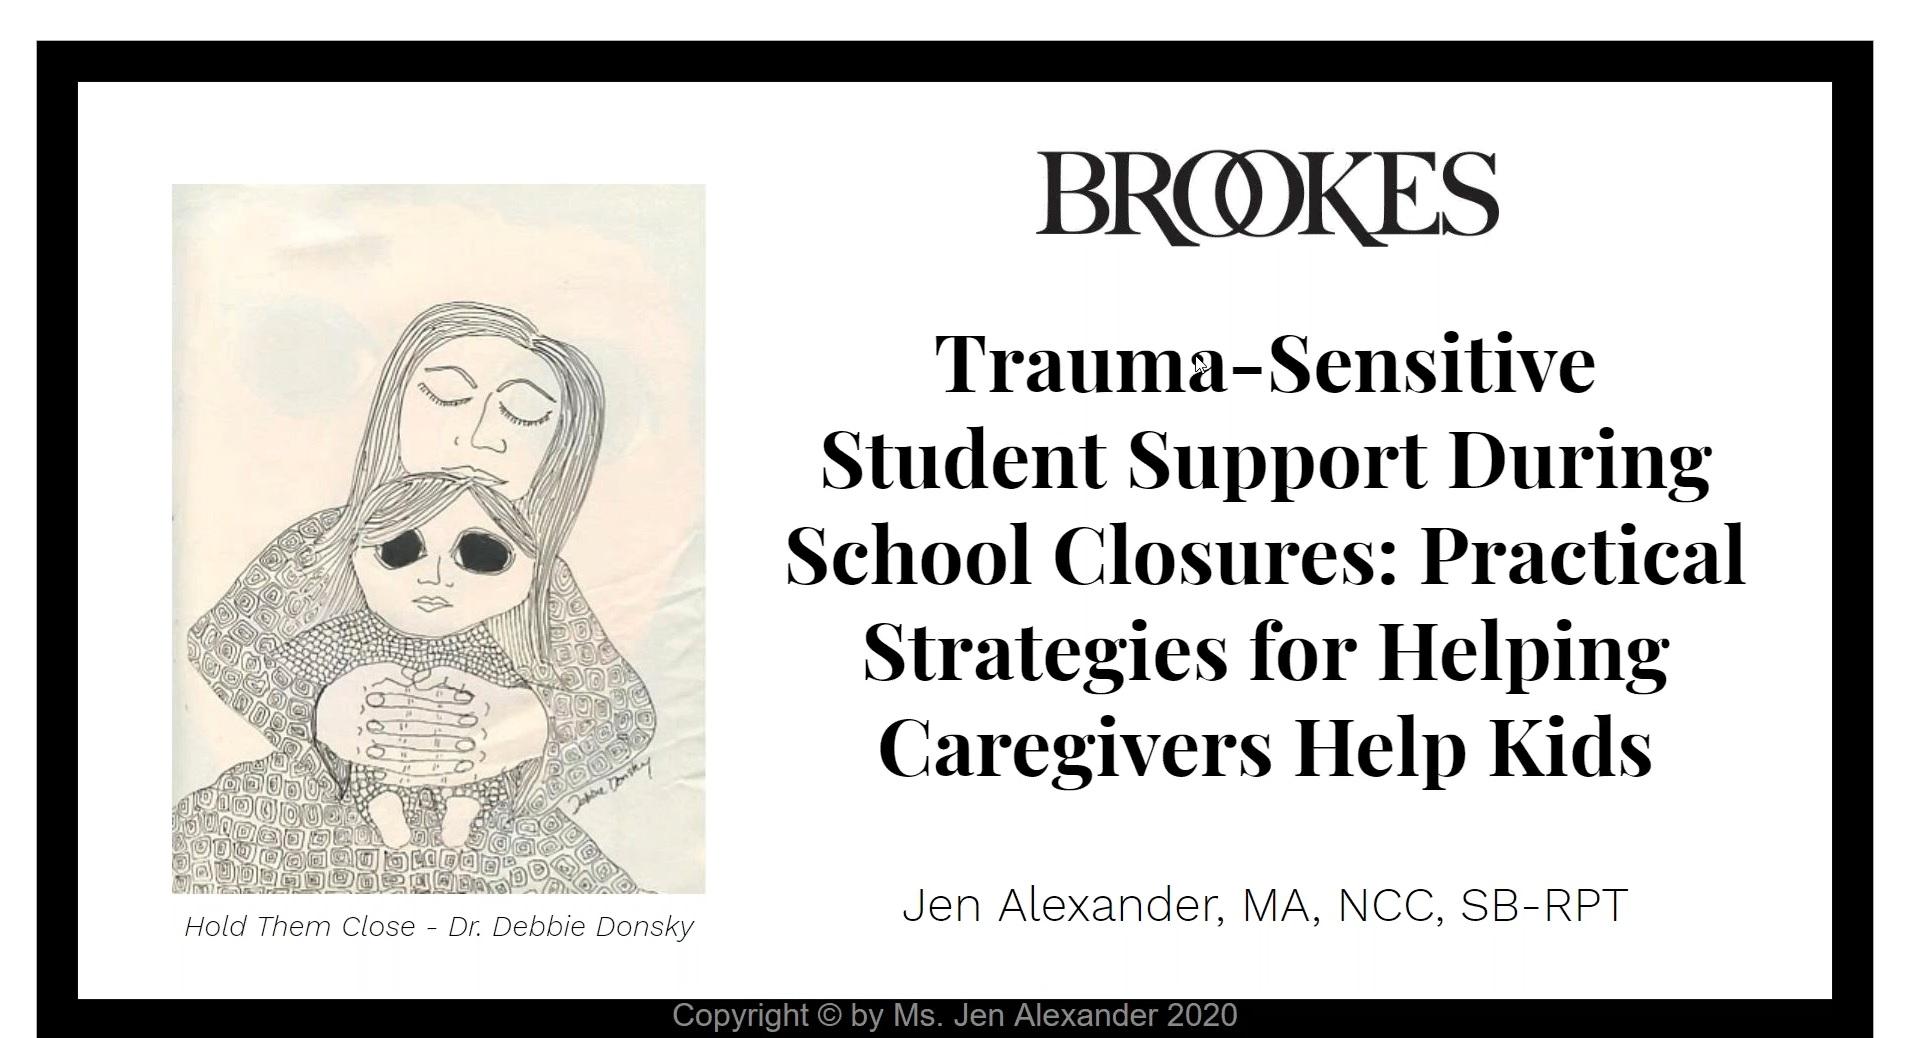 Trauma-Sensitive Student Support During School Closures webinar